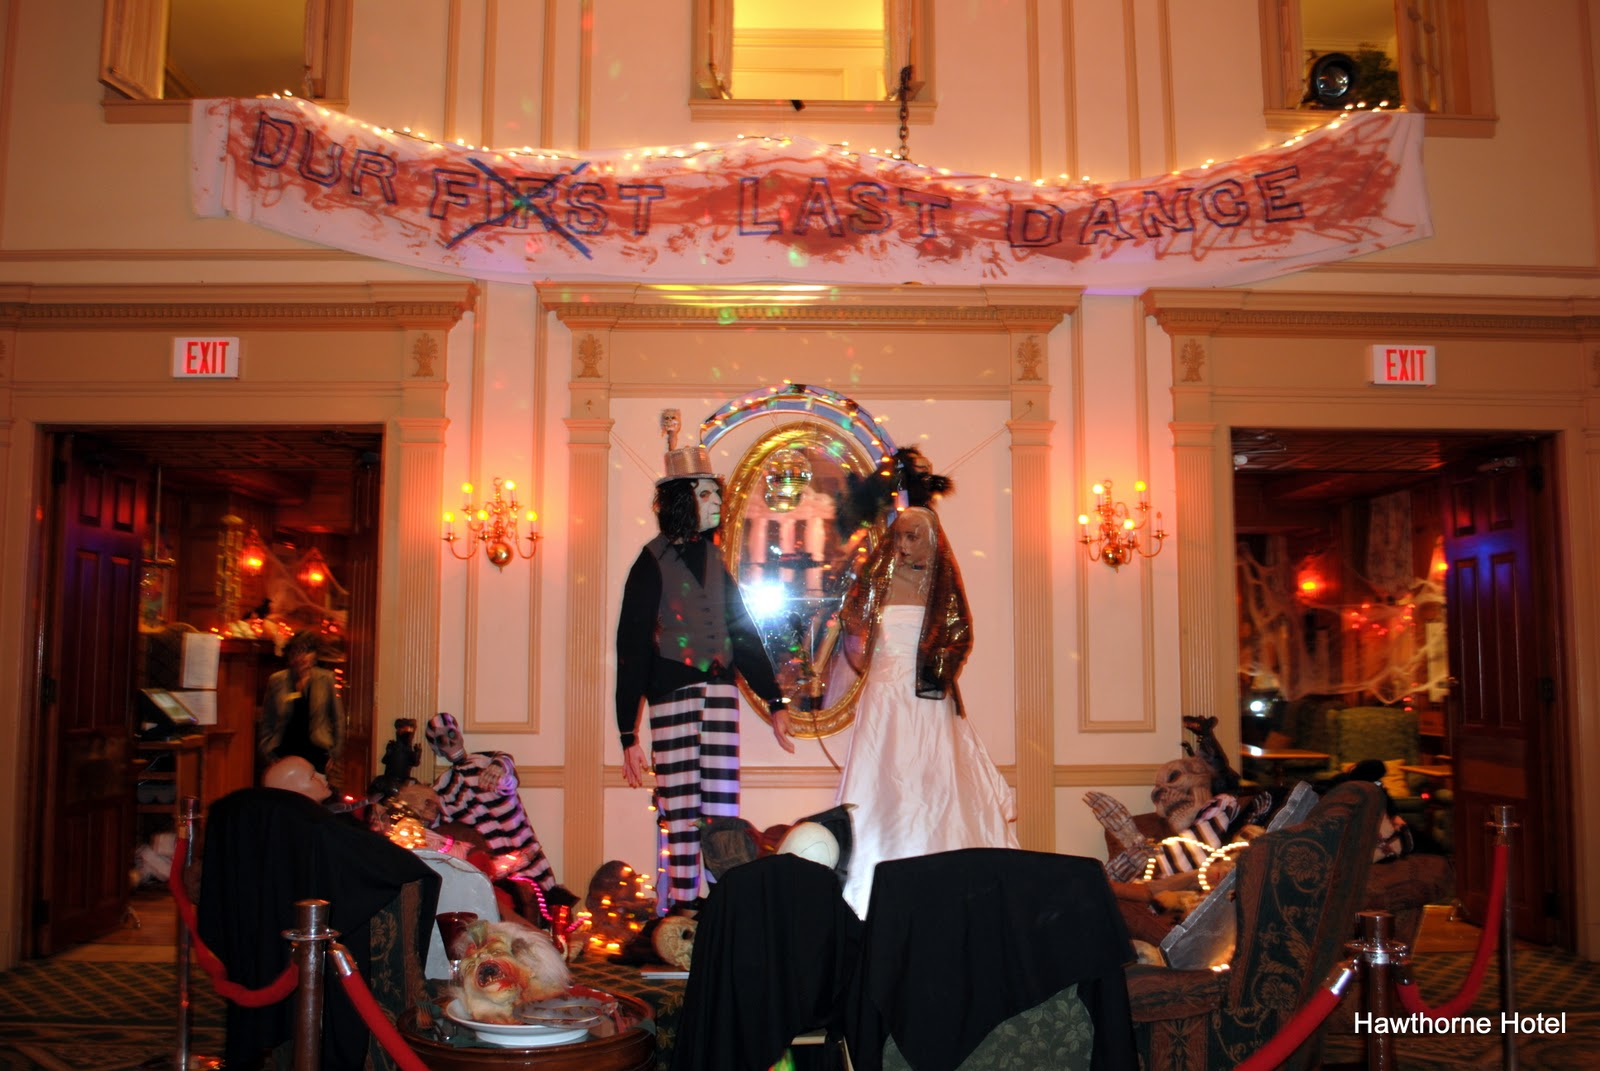 Hawthorne Hotel: October 2011